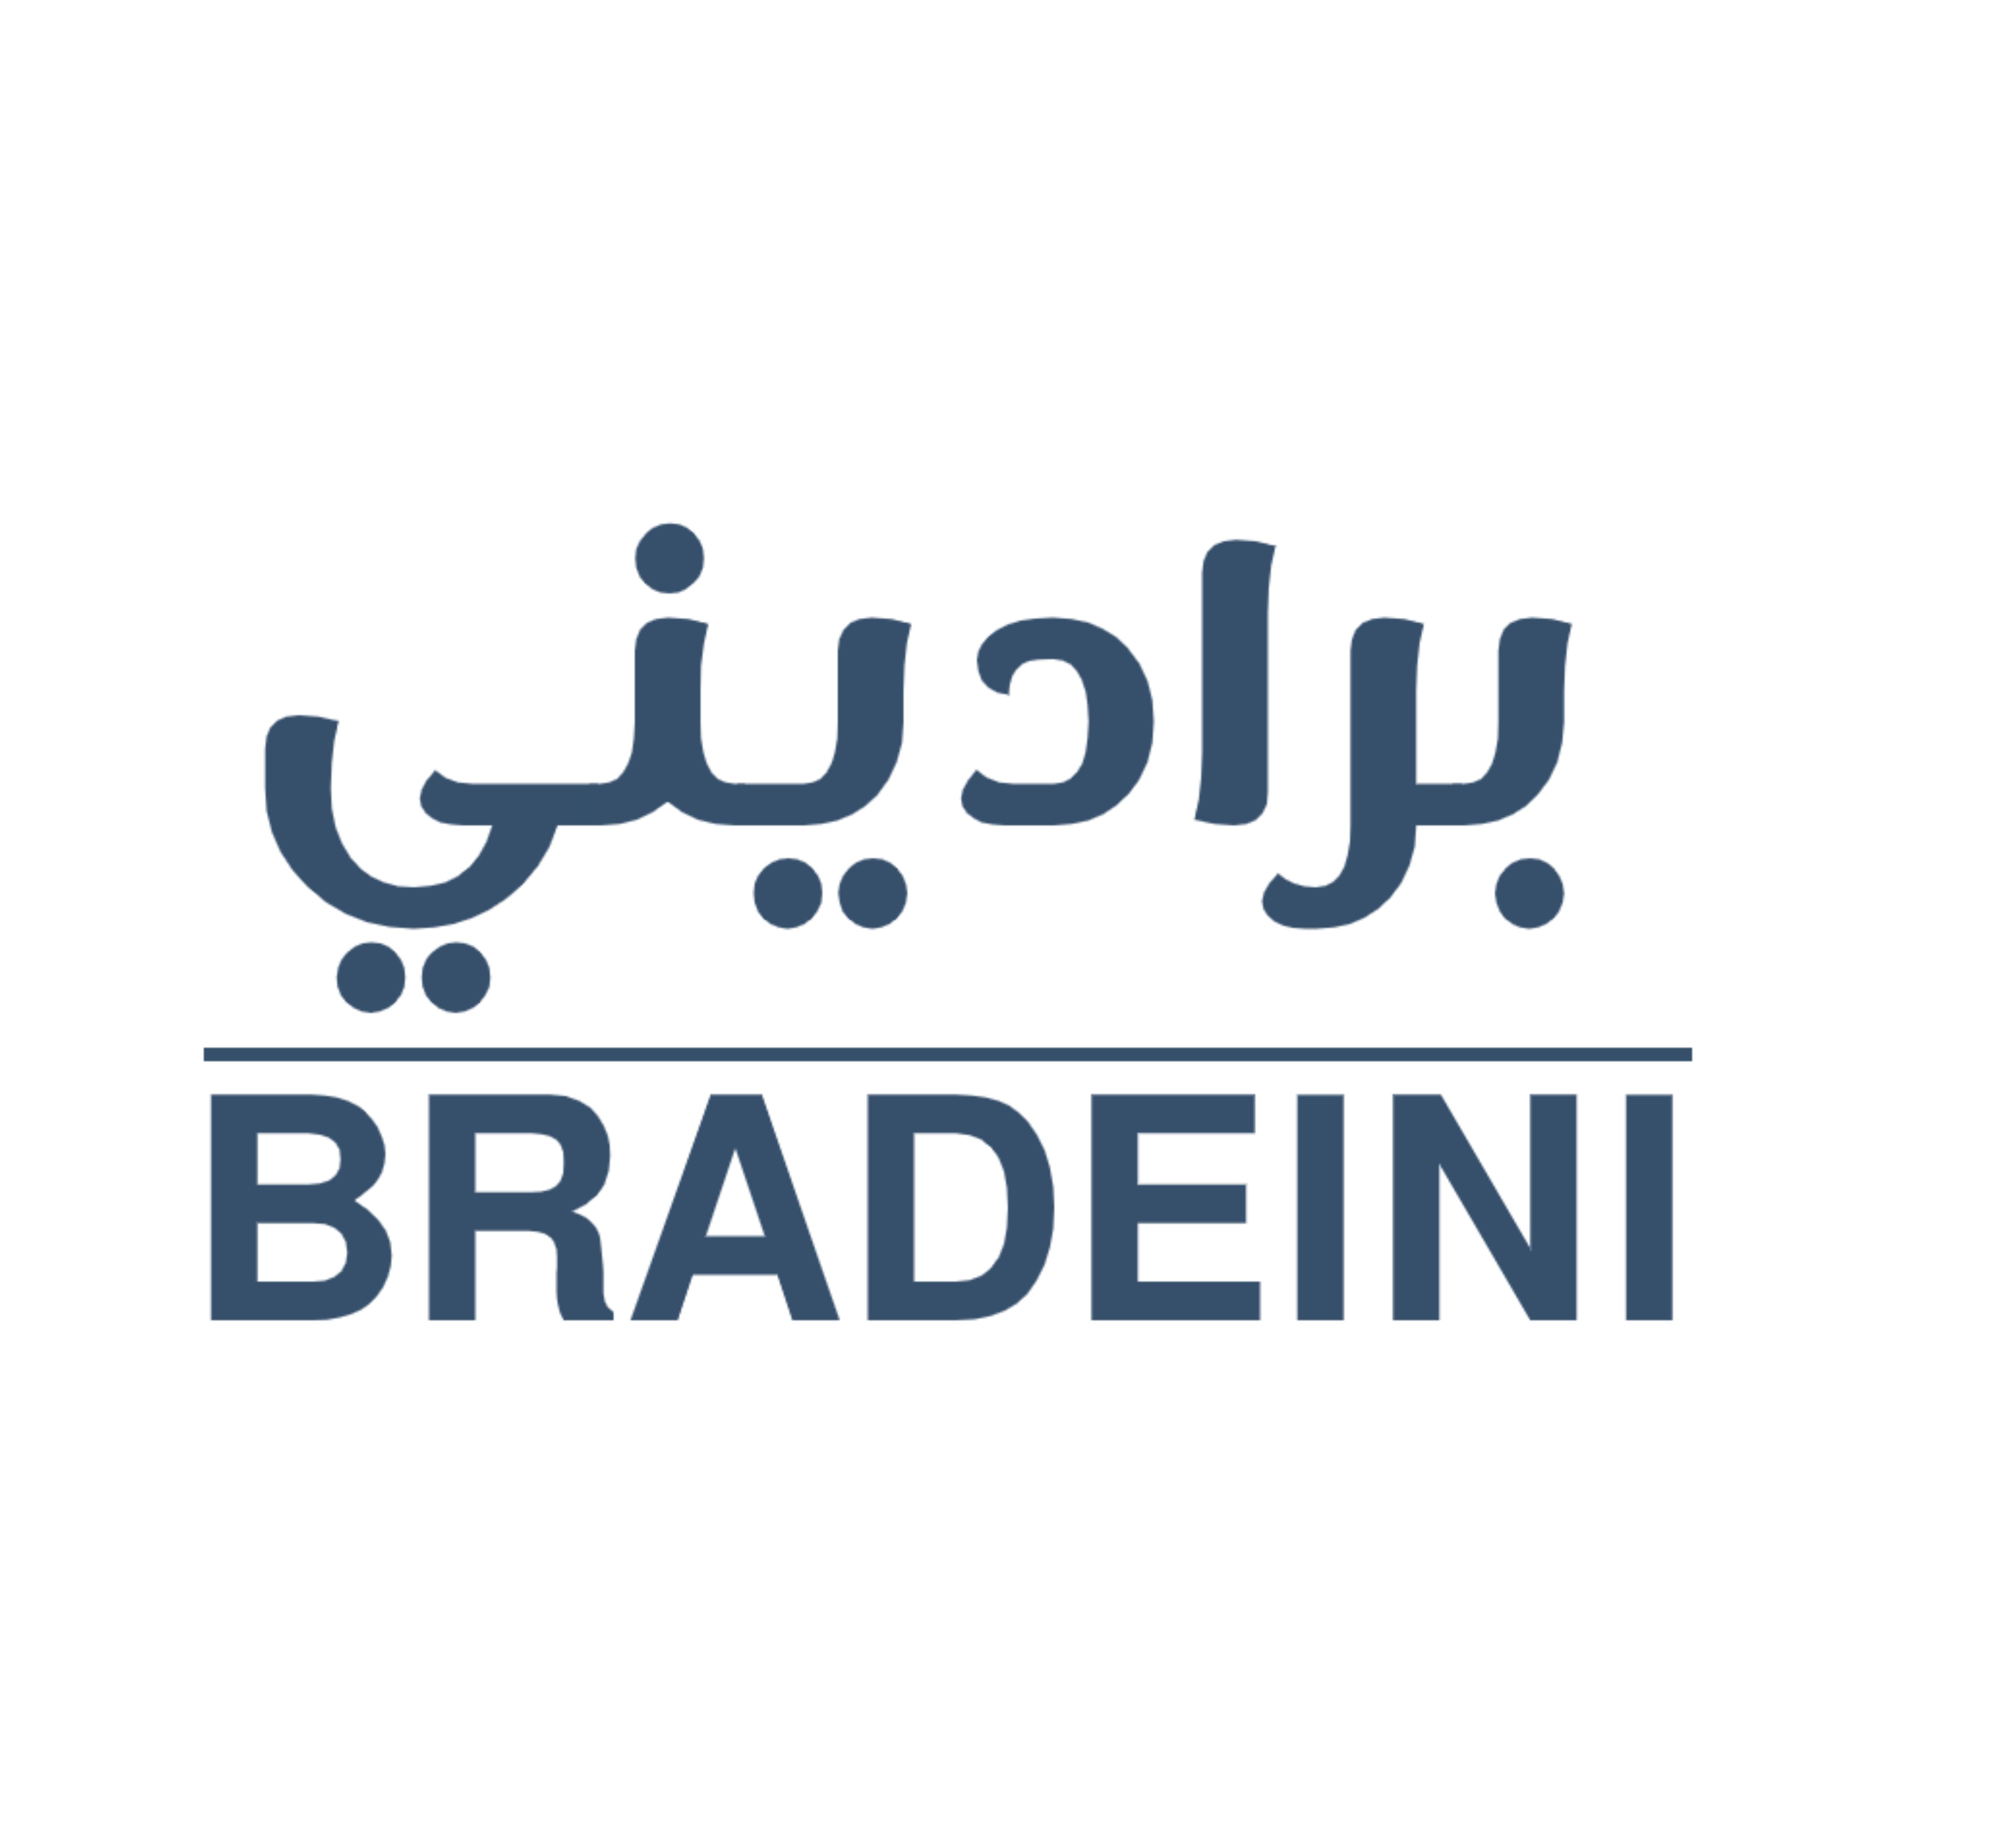 Bradeini